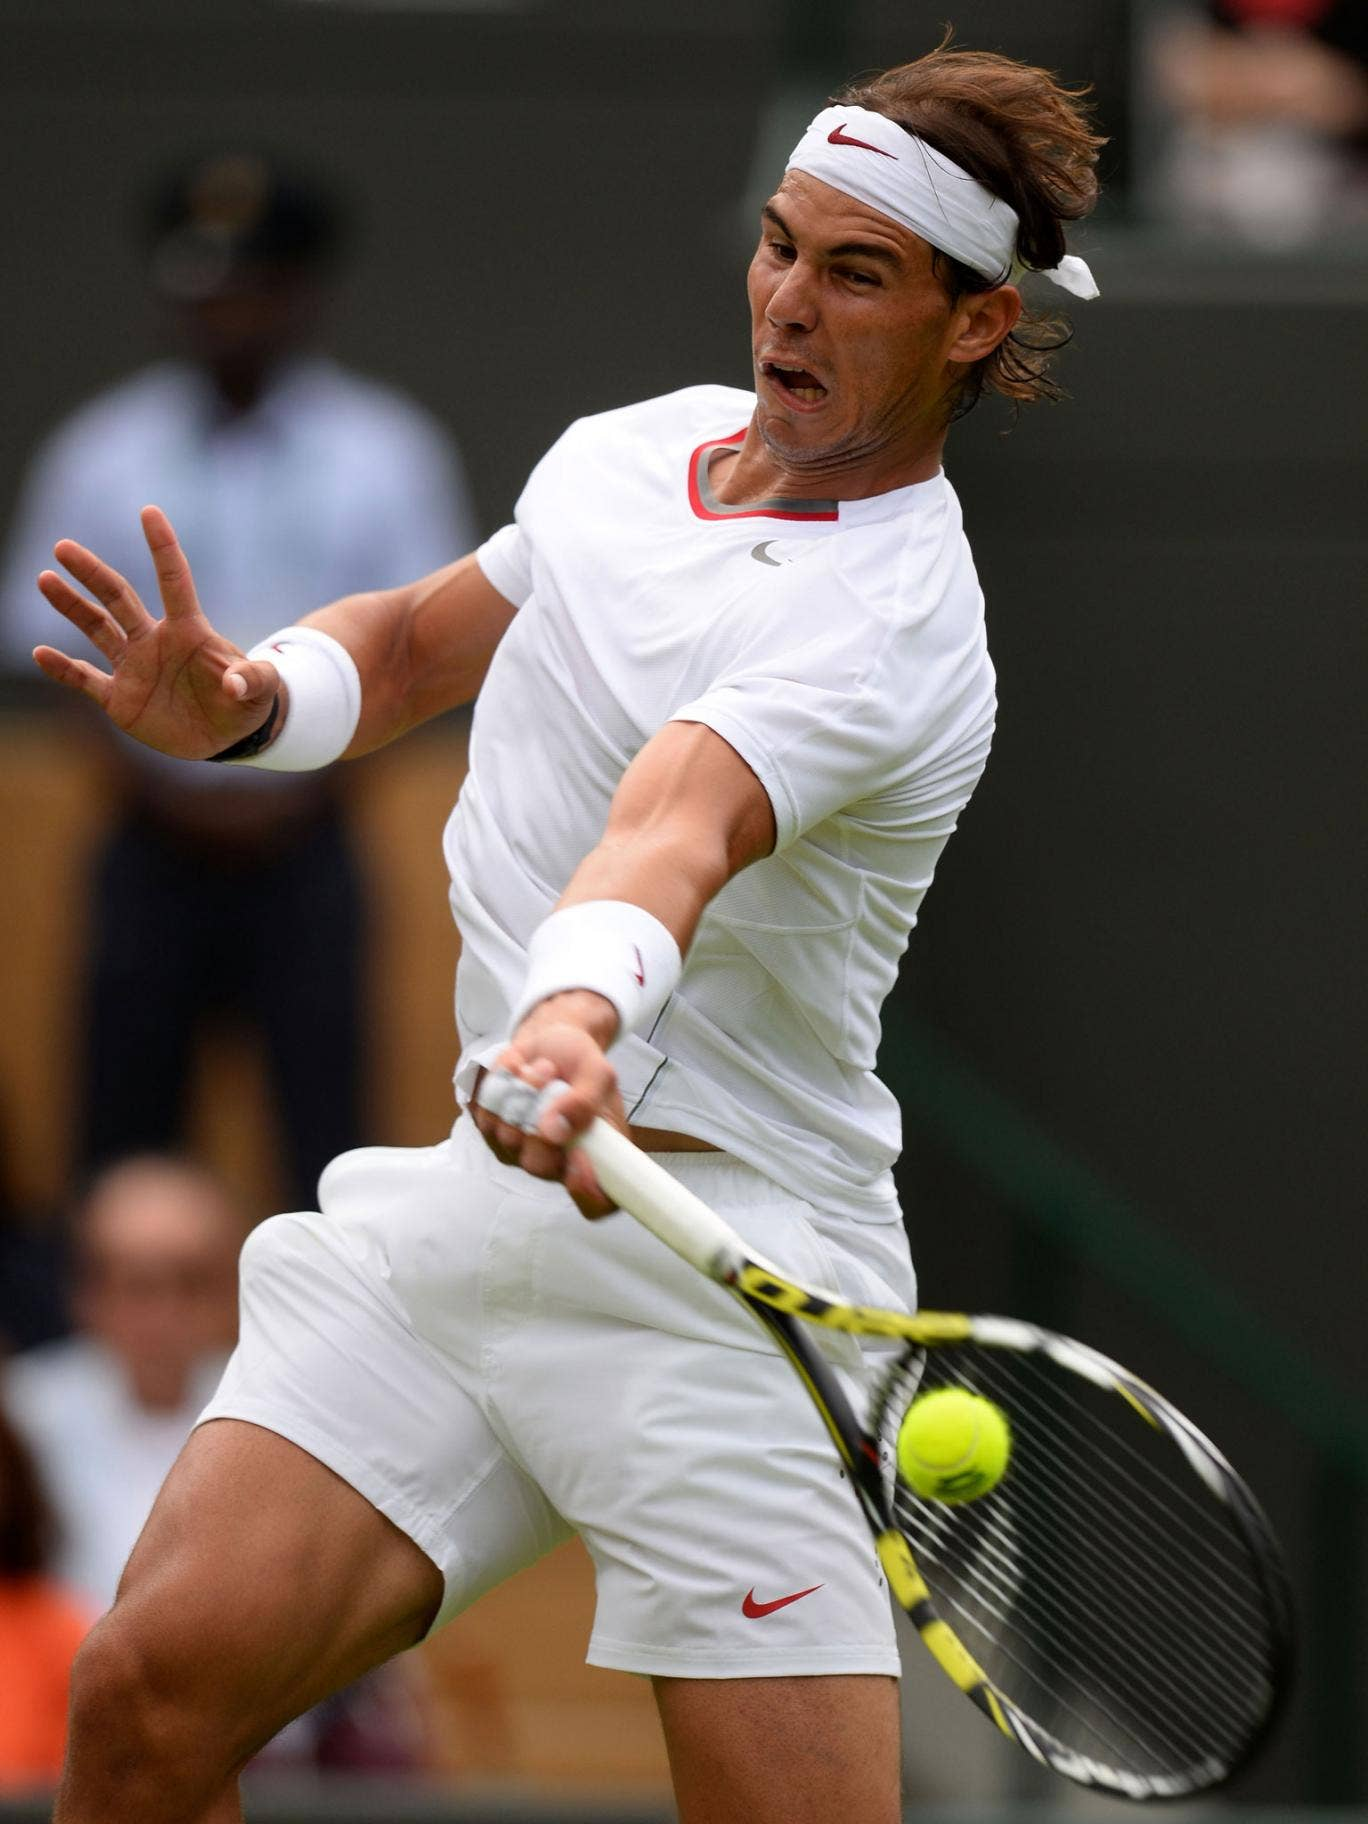 Rafael Nadal was beaten in straight sets by Steve Darcis